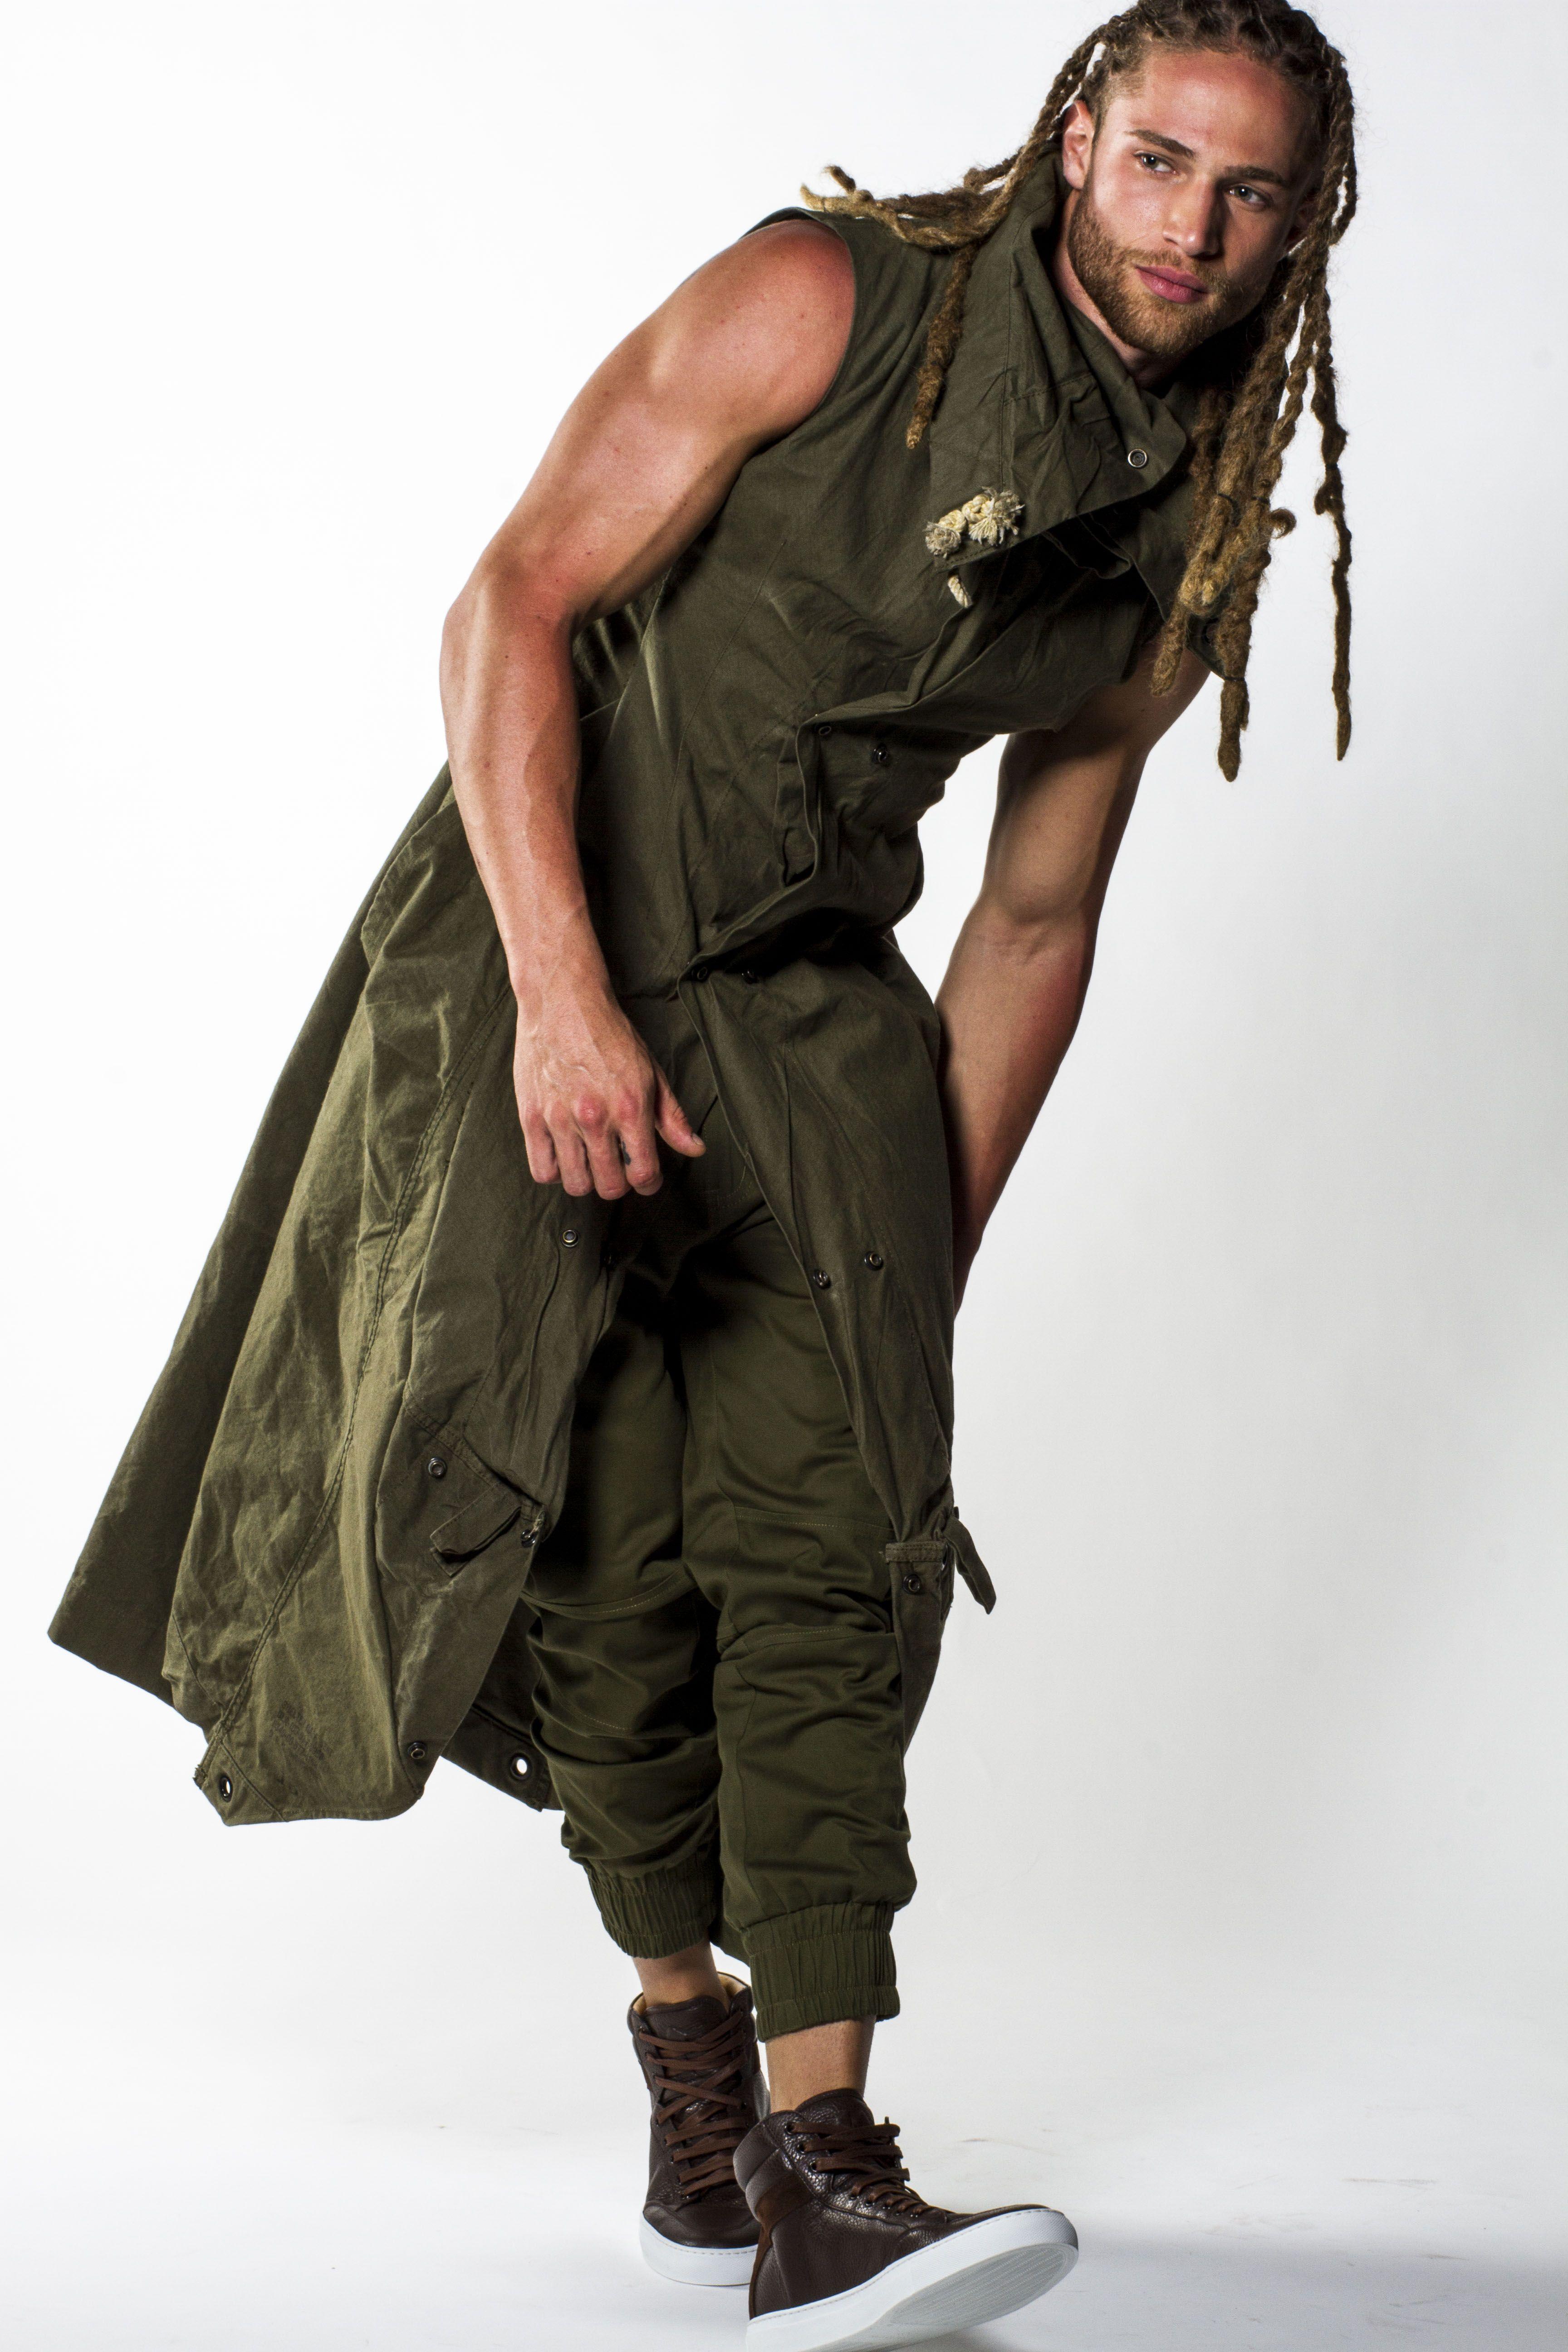 masson men Cheaper men's trousers mason's men's green cotton pants 448263401 jaebcbuu men's trousers - men's trousers mason's men's green cotton pants 448263401 jaebcbuu mason's pants mason's, cotton 98%, elastane 2%, color green, fw16, product cod.